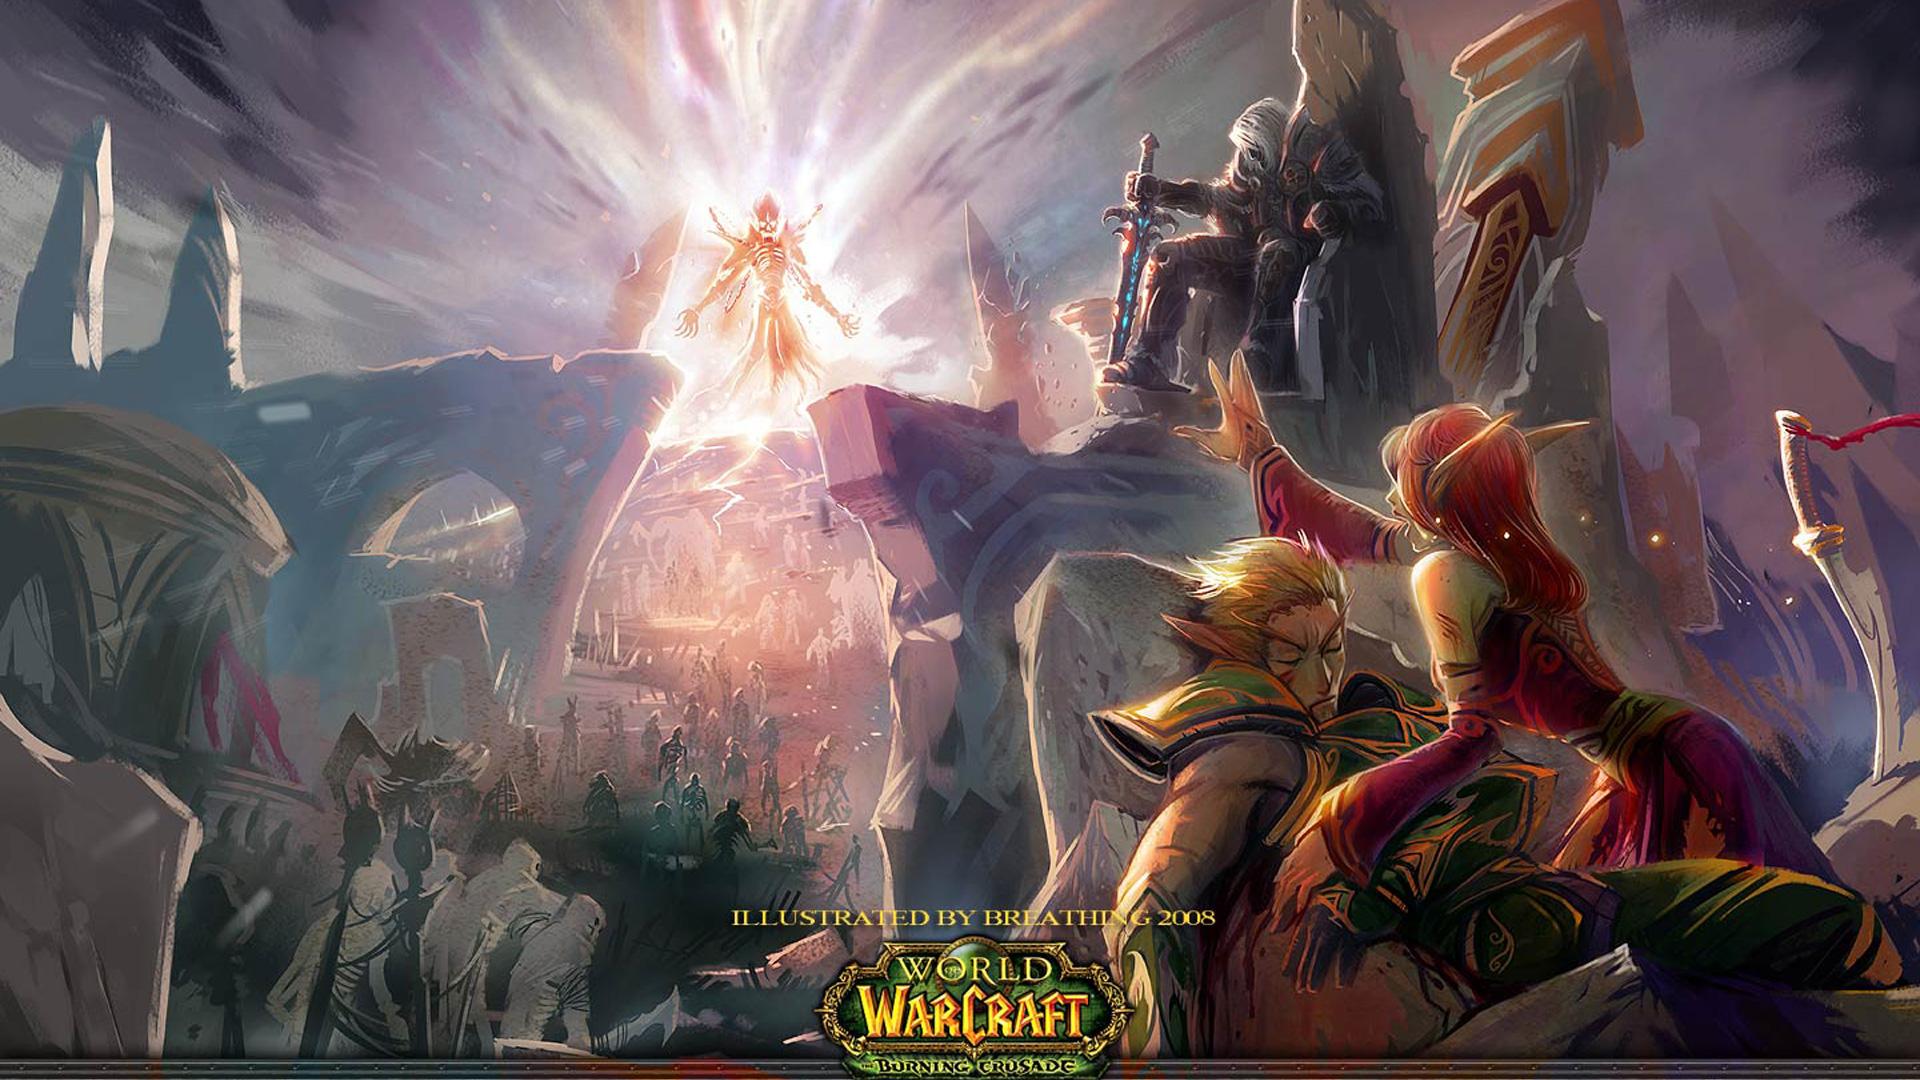 World Of Warcraft Backgrounds 1920x1080: 1920X1080 Wow Wallpaper